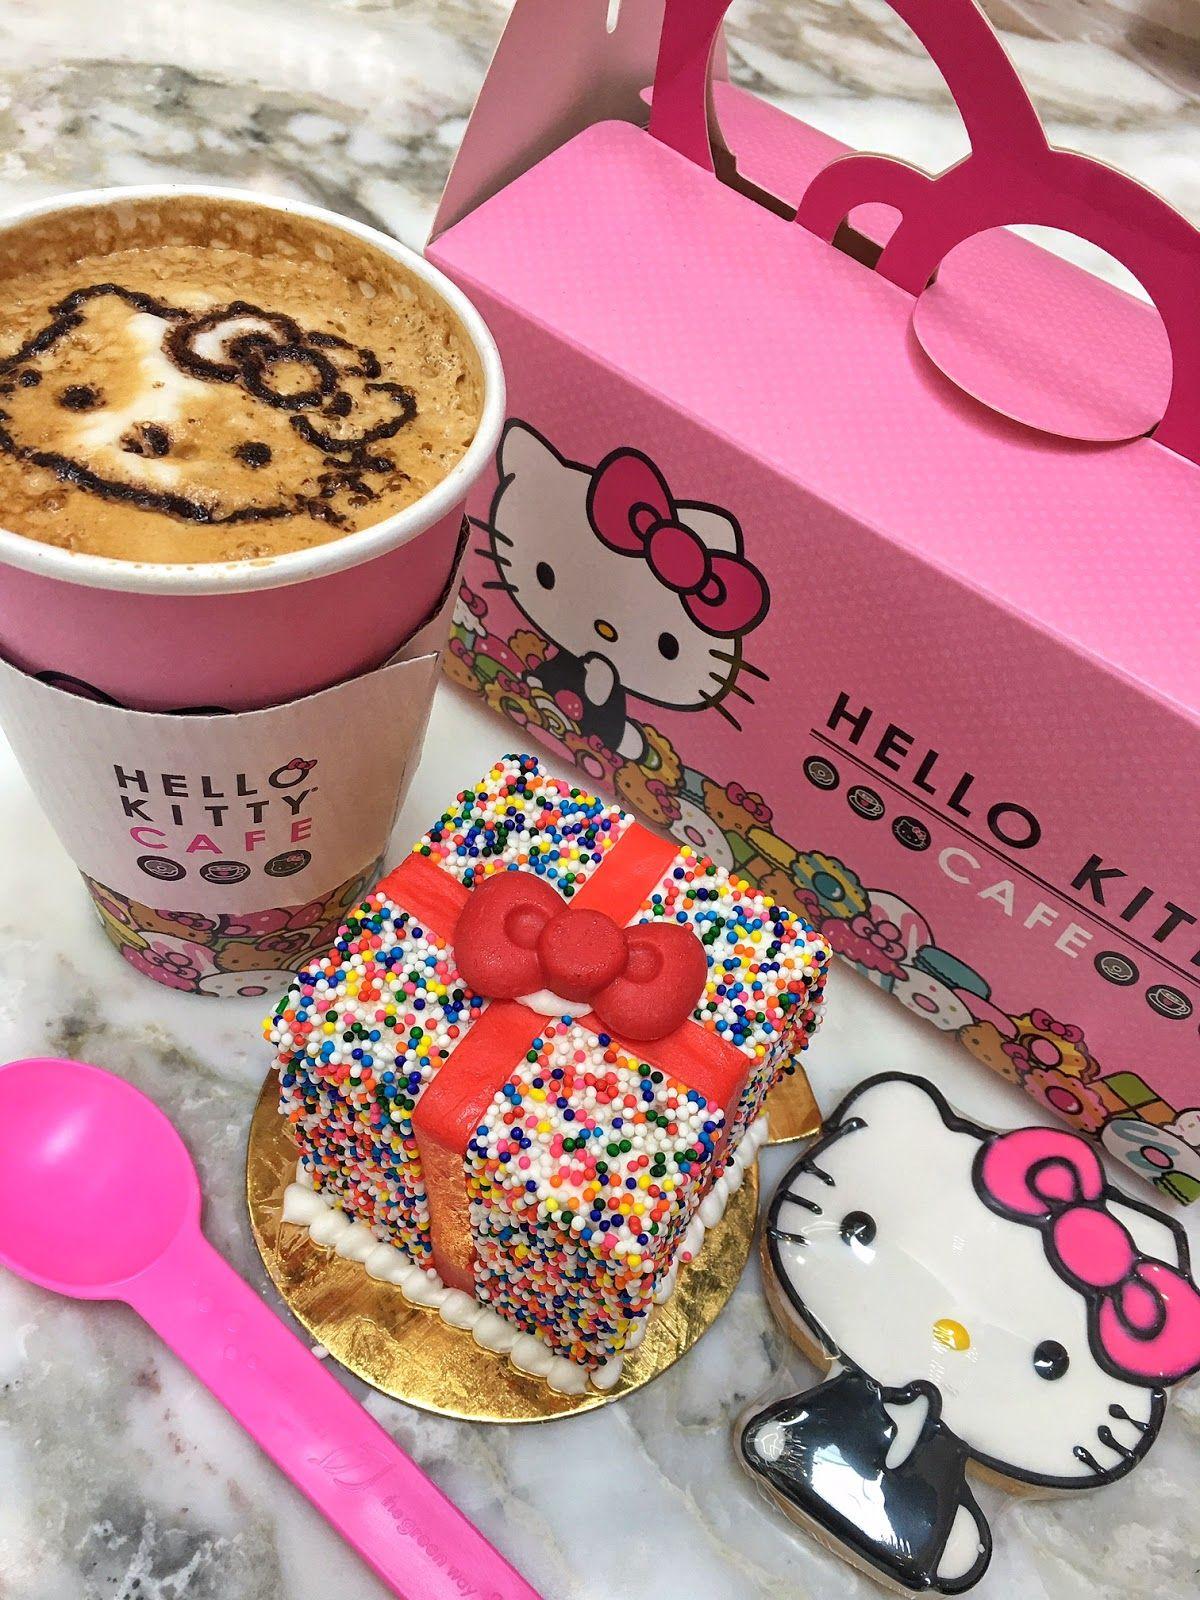 La Locals Love Hello Kitty Cafe Life In Wanderlust Kitty Cafe Hello Kitty Cake Cafe Hello Kitty